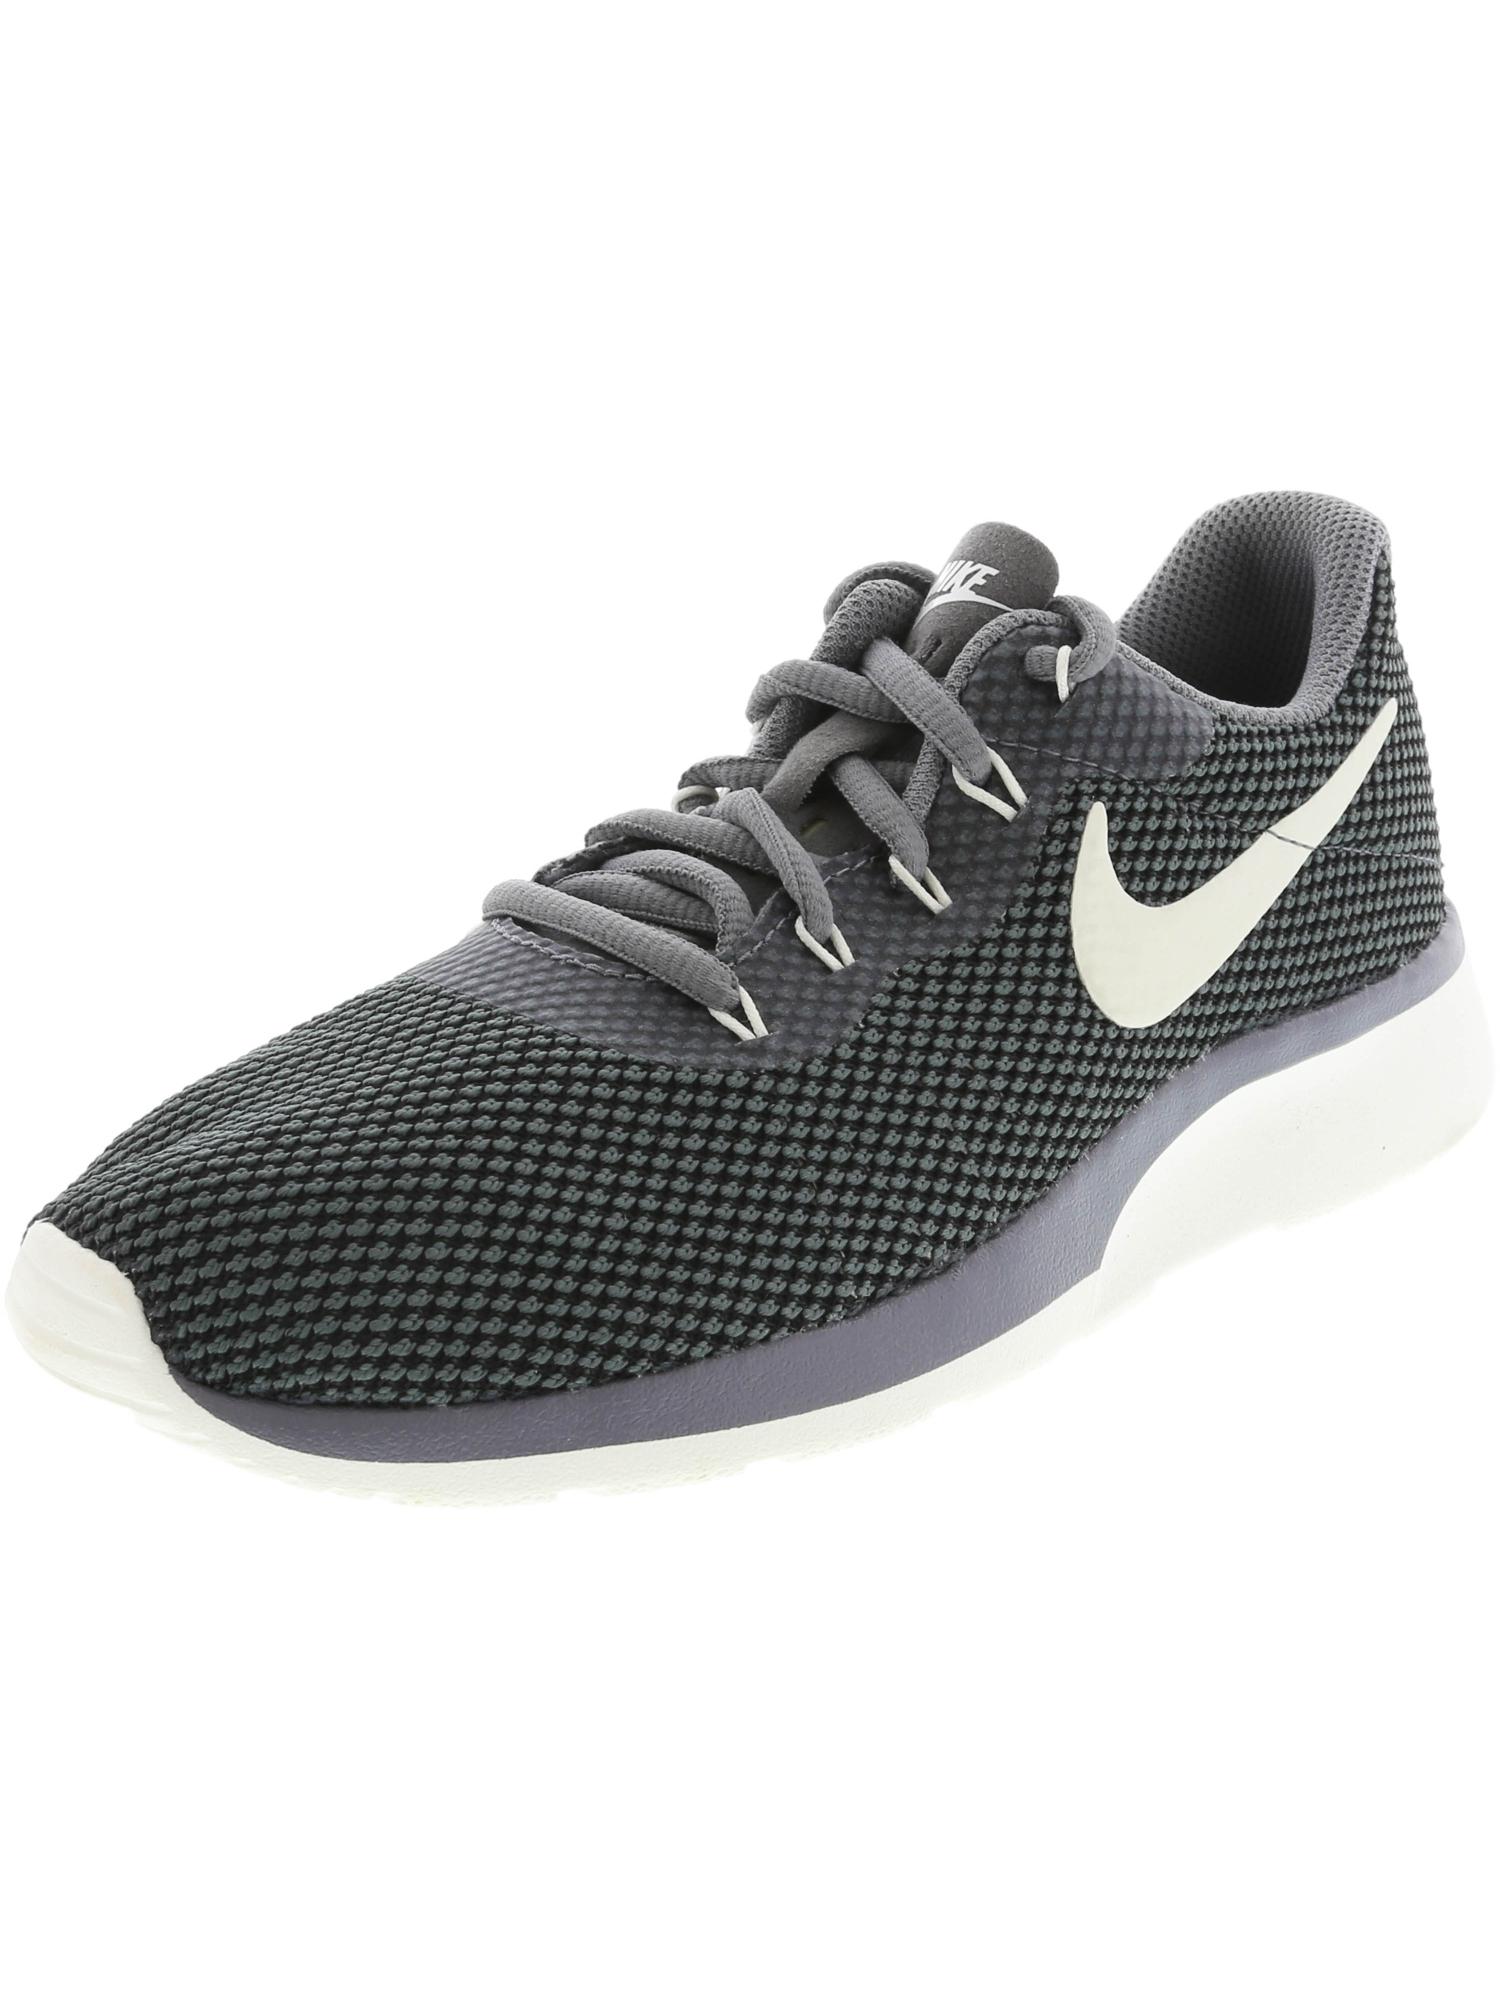 Nike-Women-039-s-Tanjun-Racer-Ankle-High-Running-Shoe